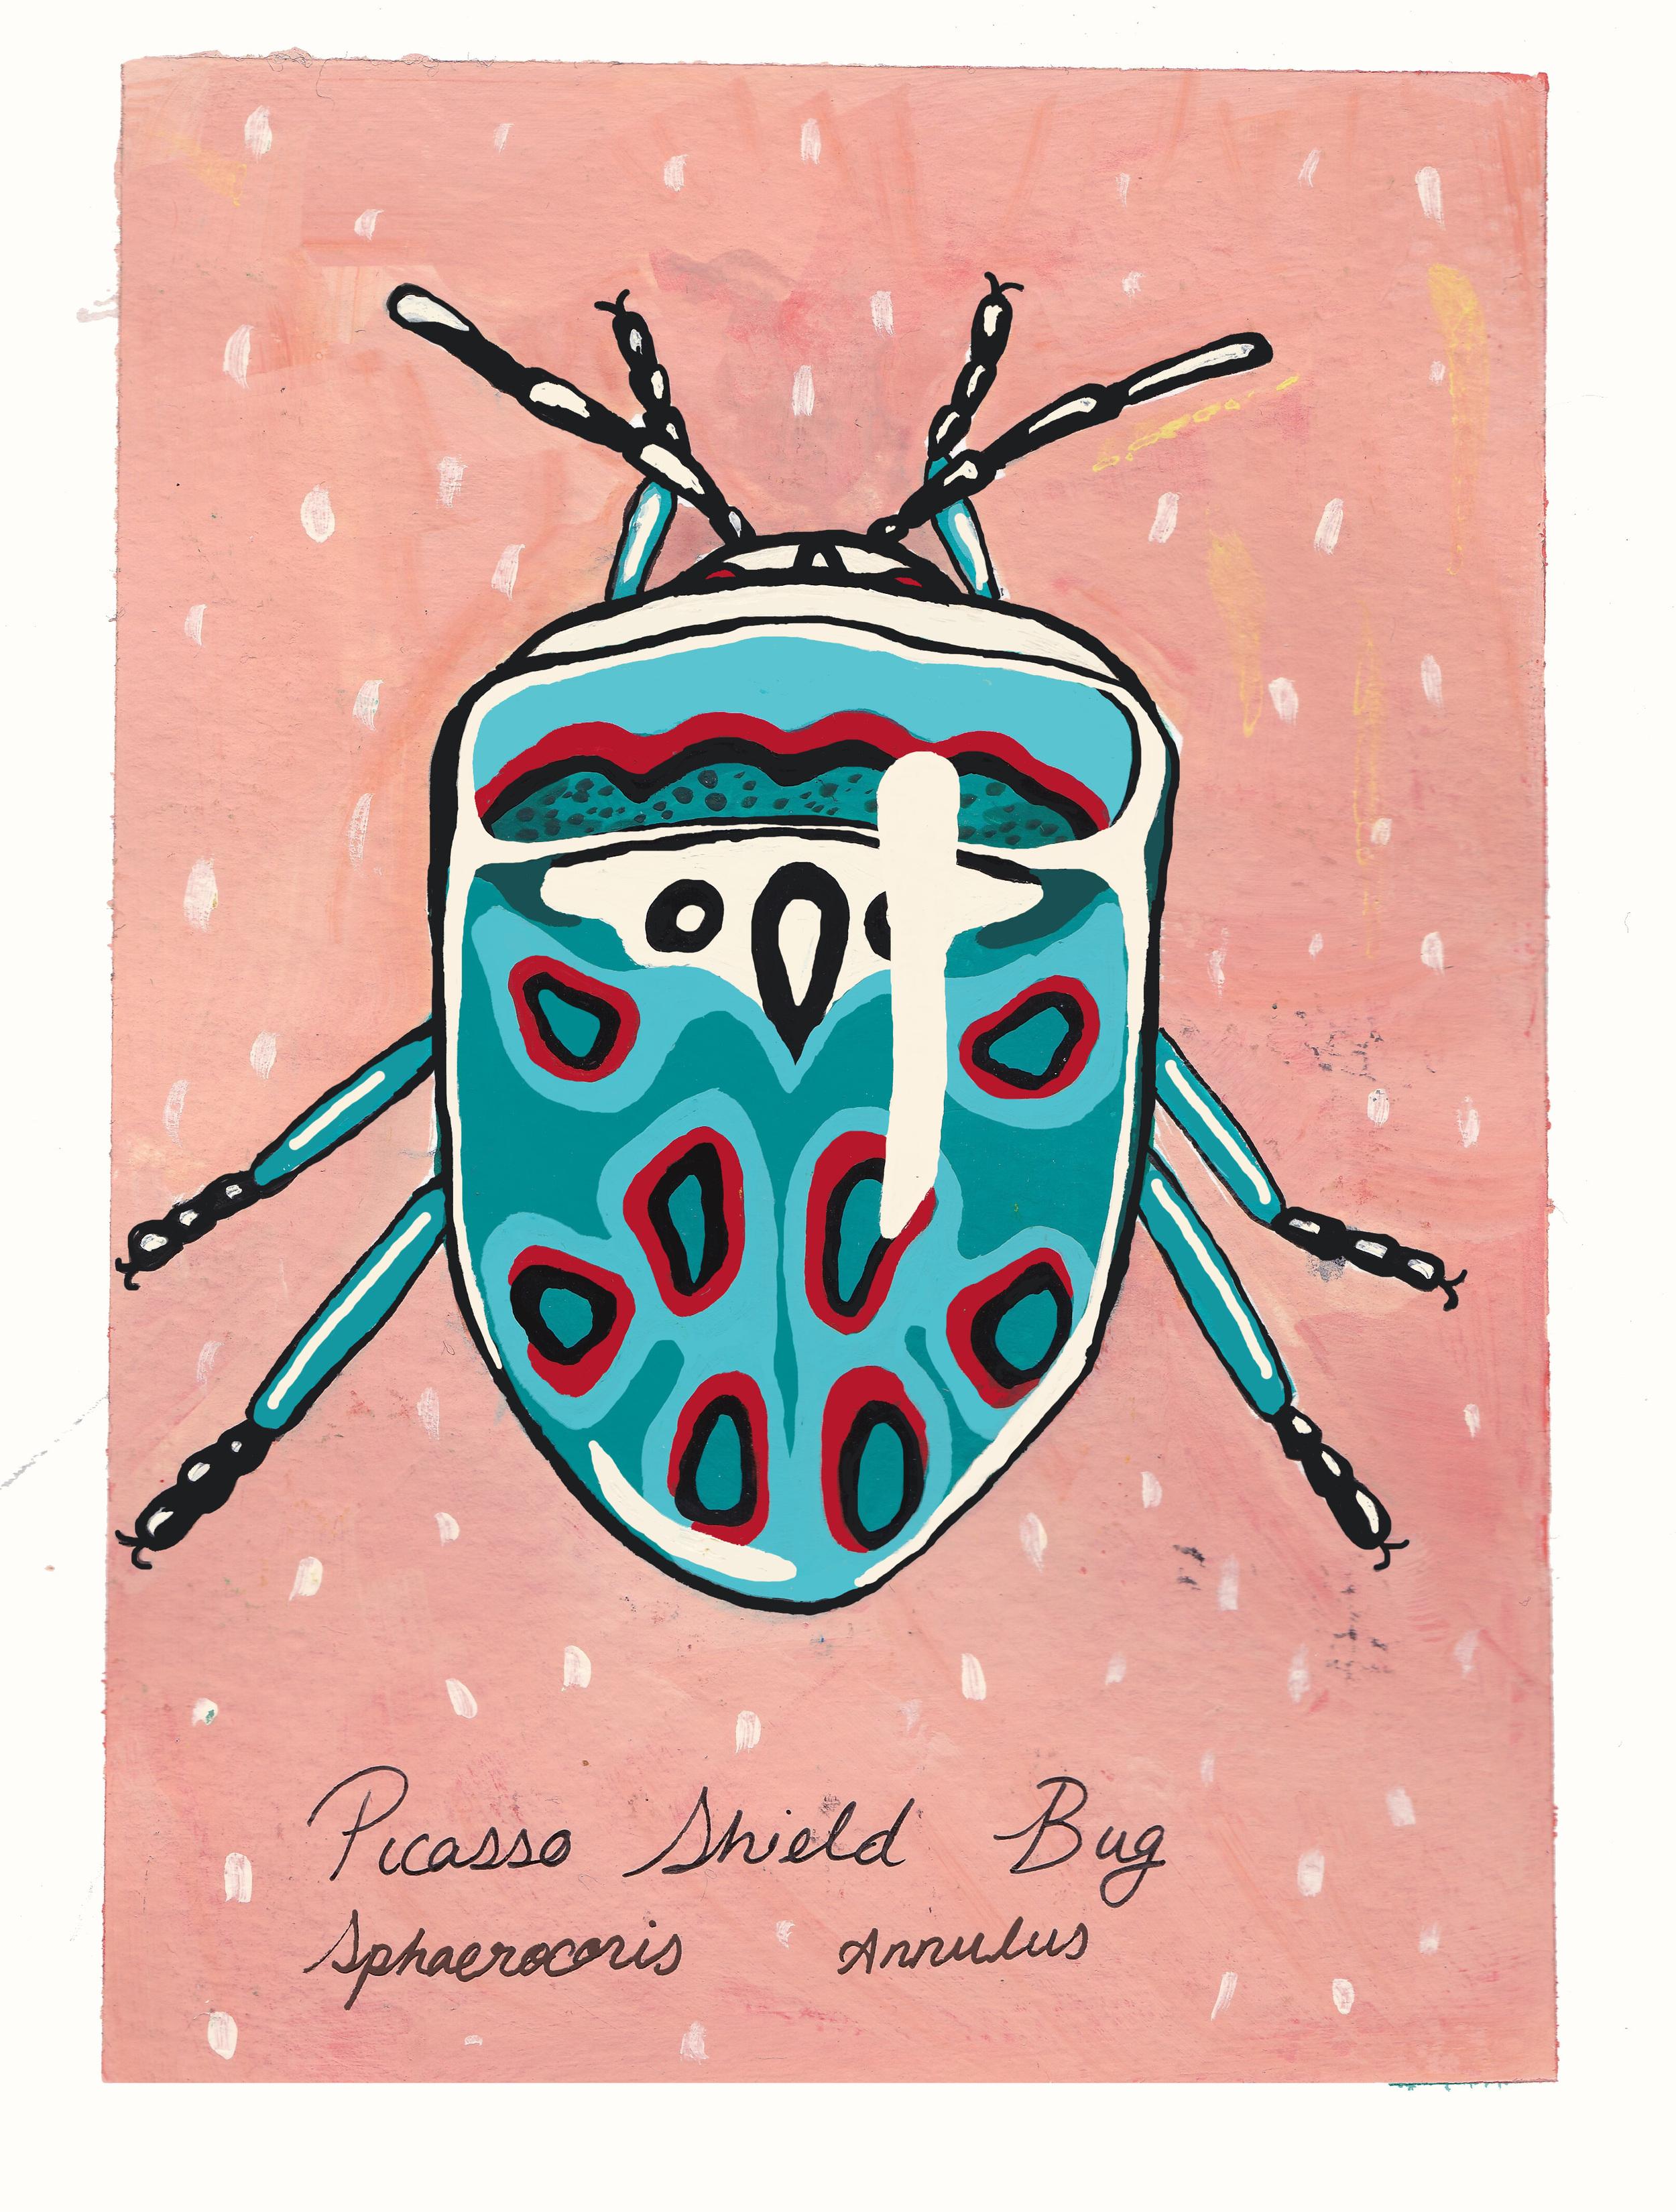 picasso shield bug gouache 5x7 2016